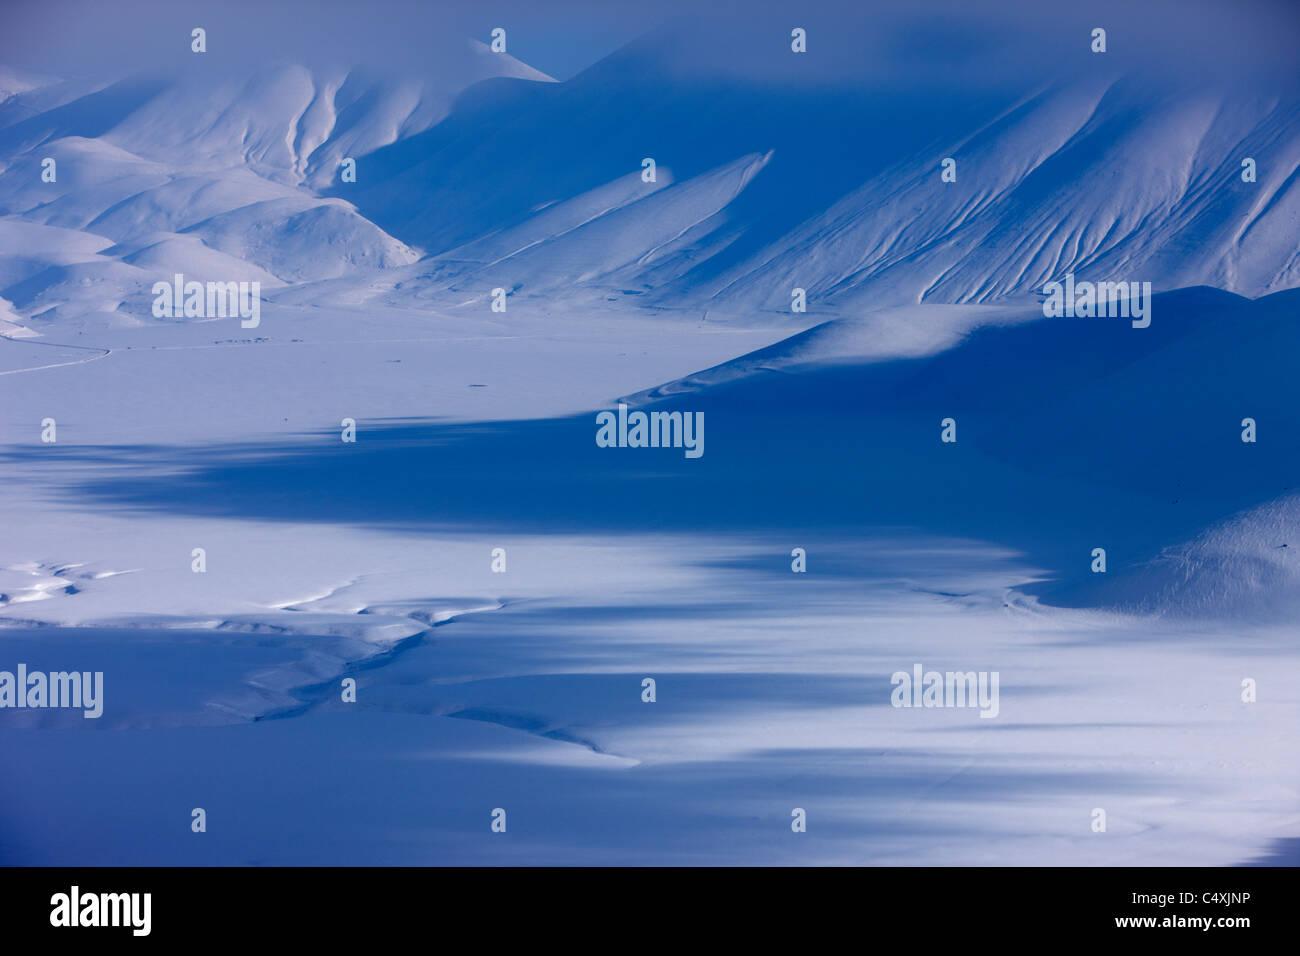 O Piano Grande no inverno, Parque Nacional de Monti Sibillini, Úmbria, Itália Imagens de Stock